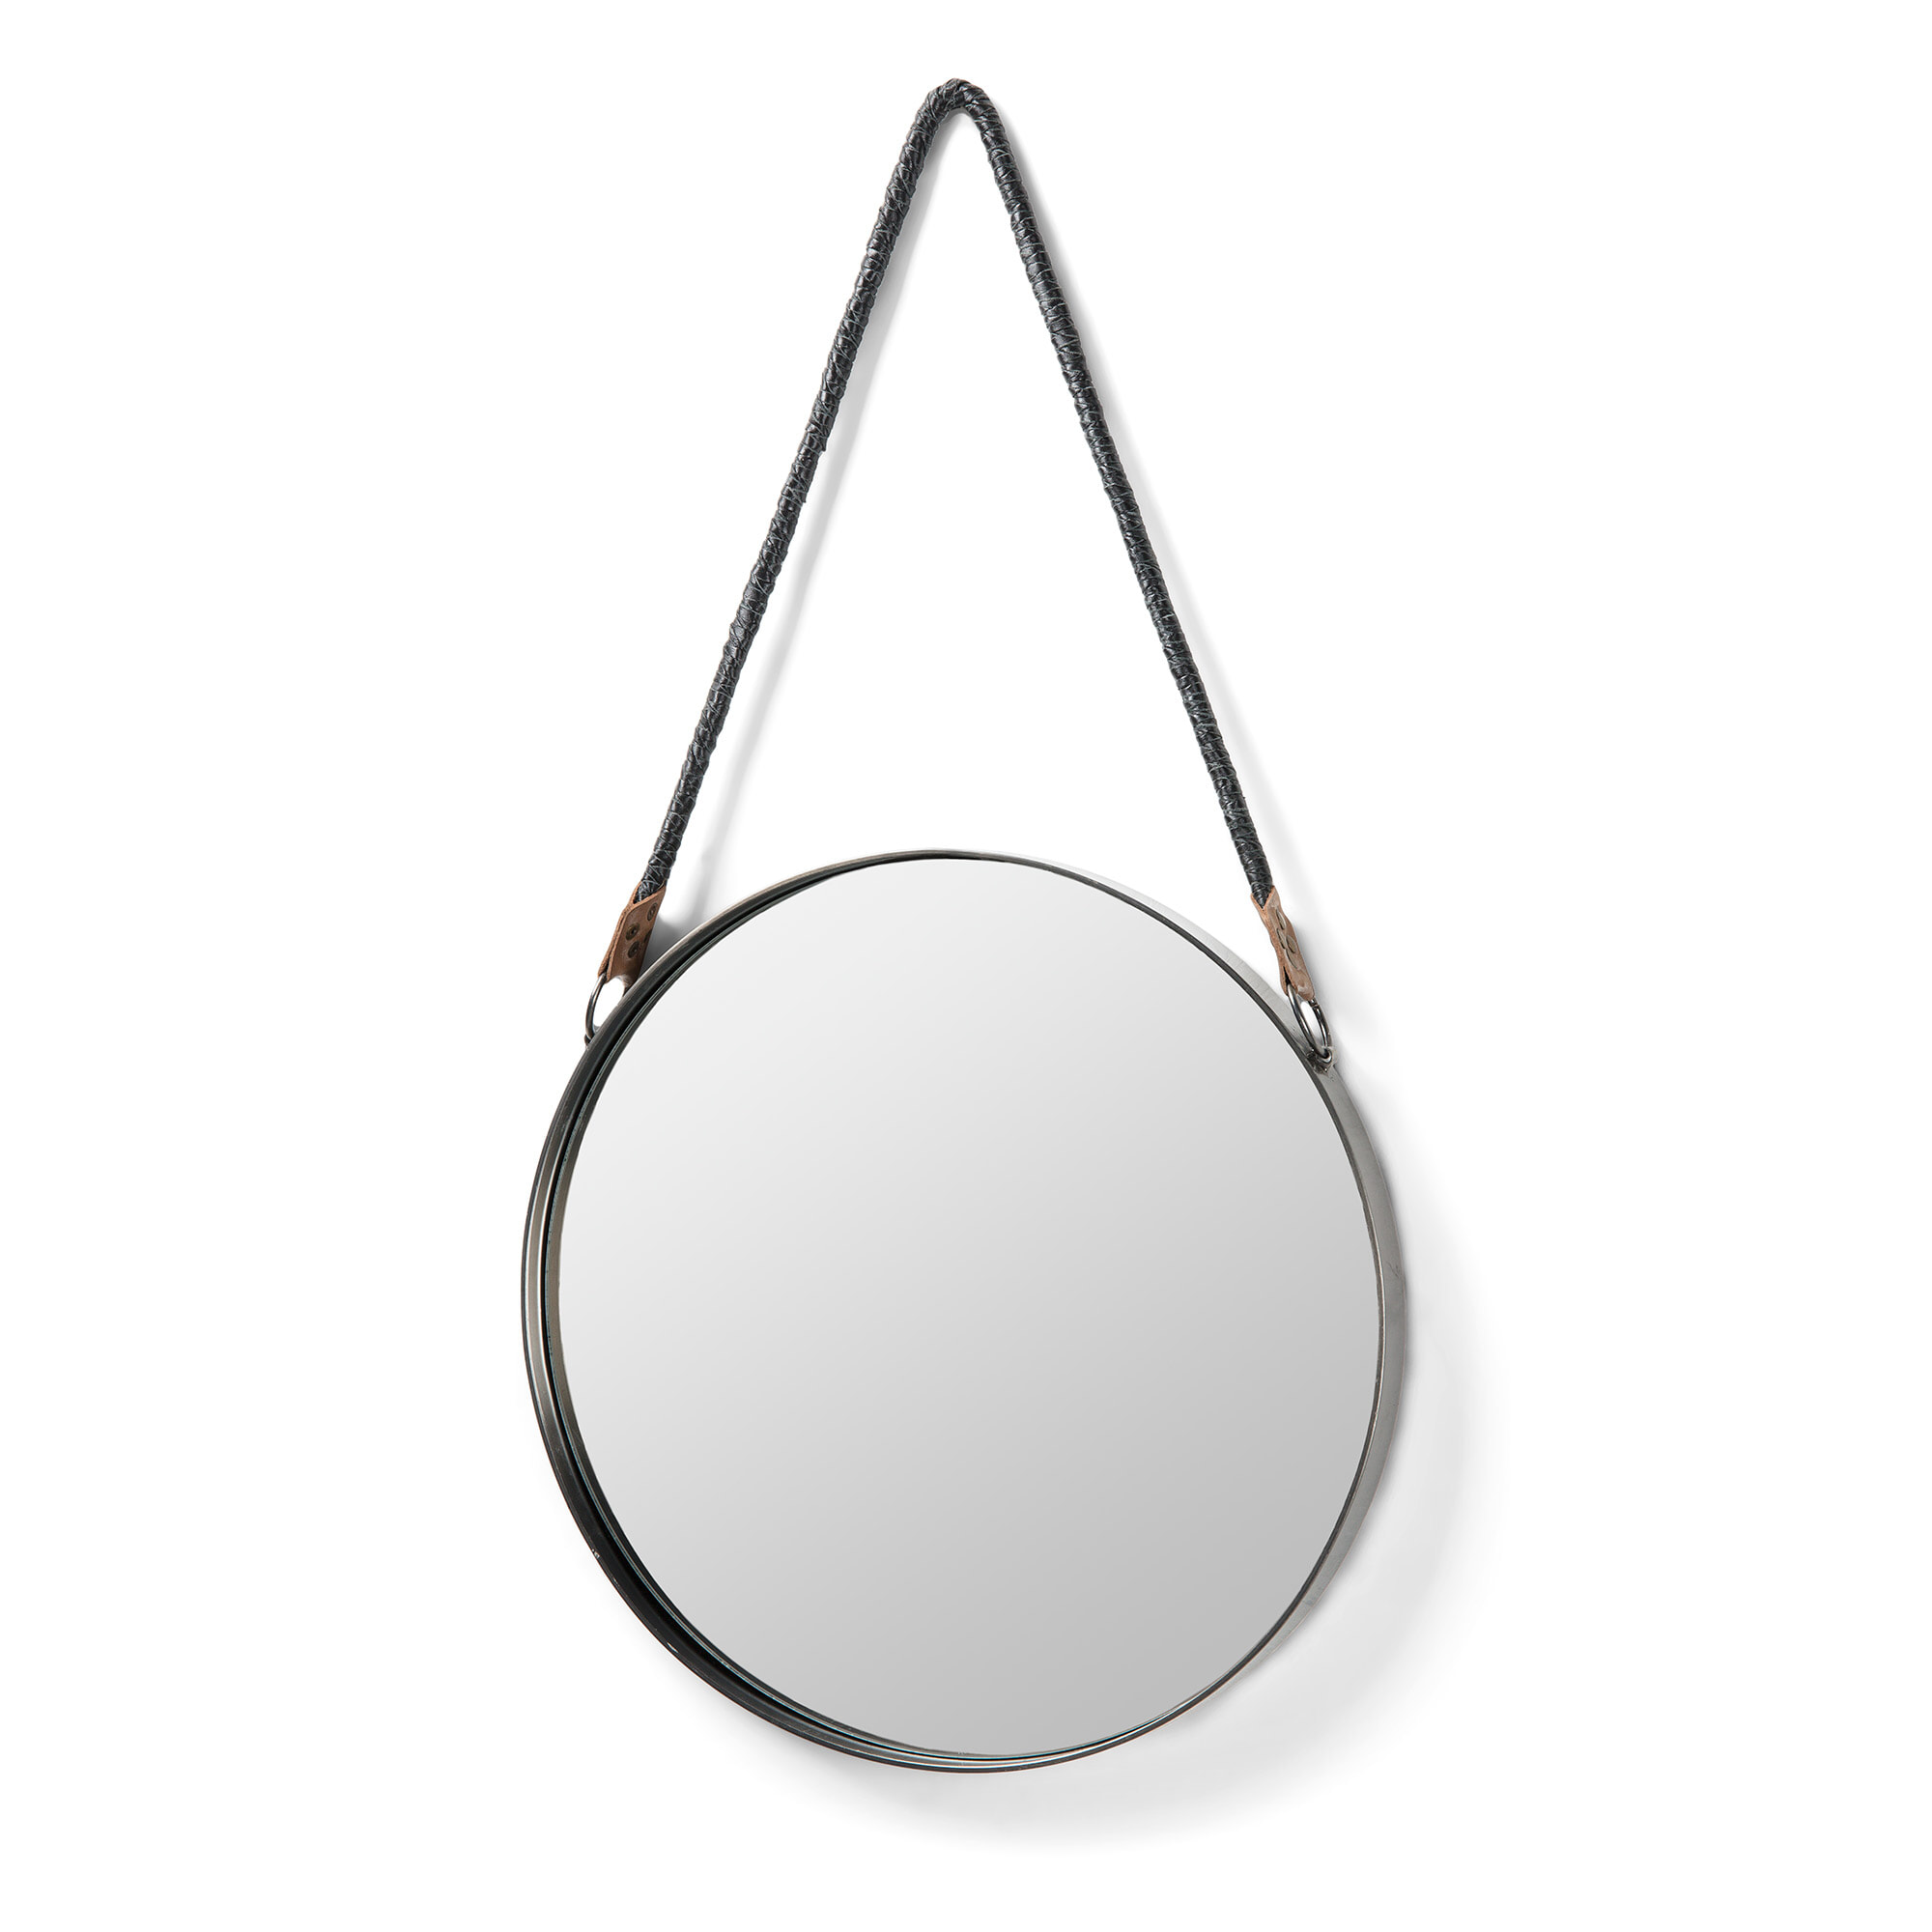 Kavehome Metal Round Accent Mirror Silver 39cm W X 4cm D Ebay